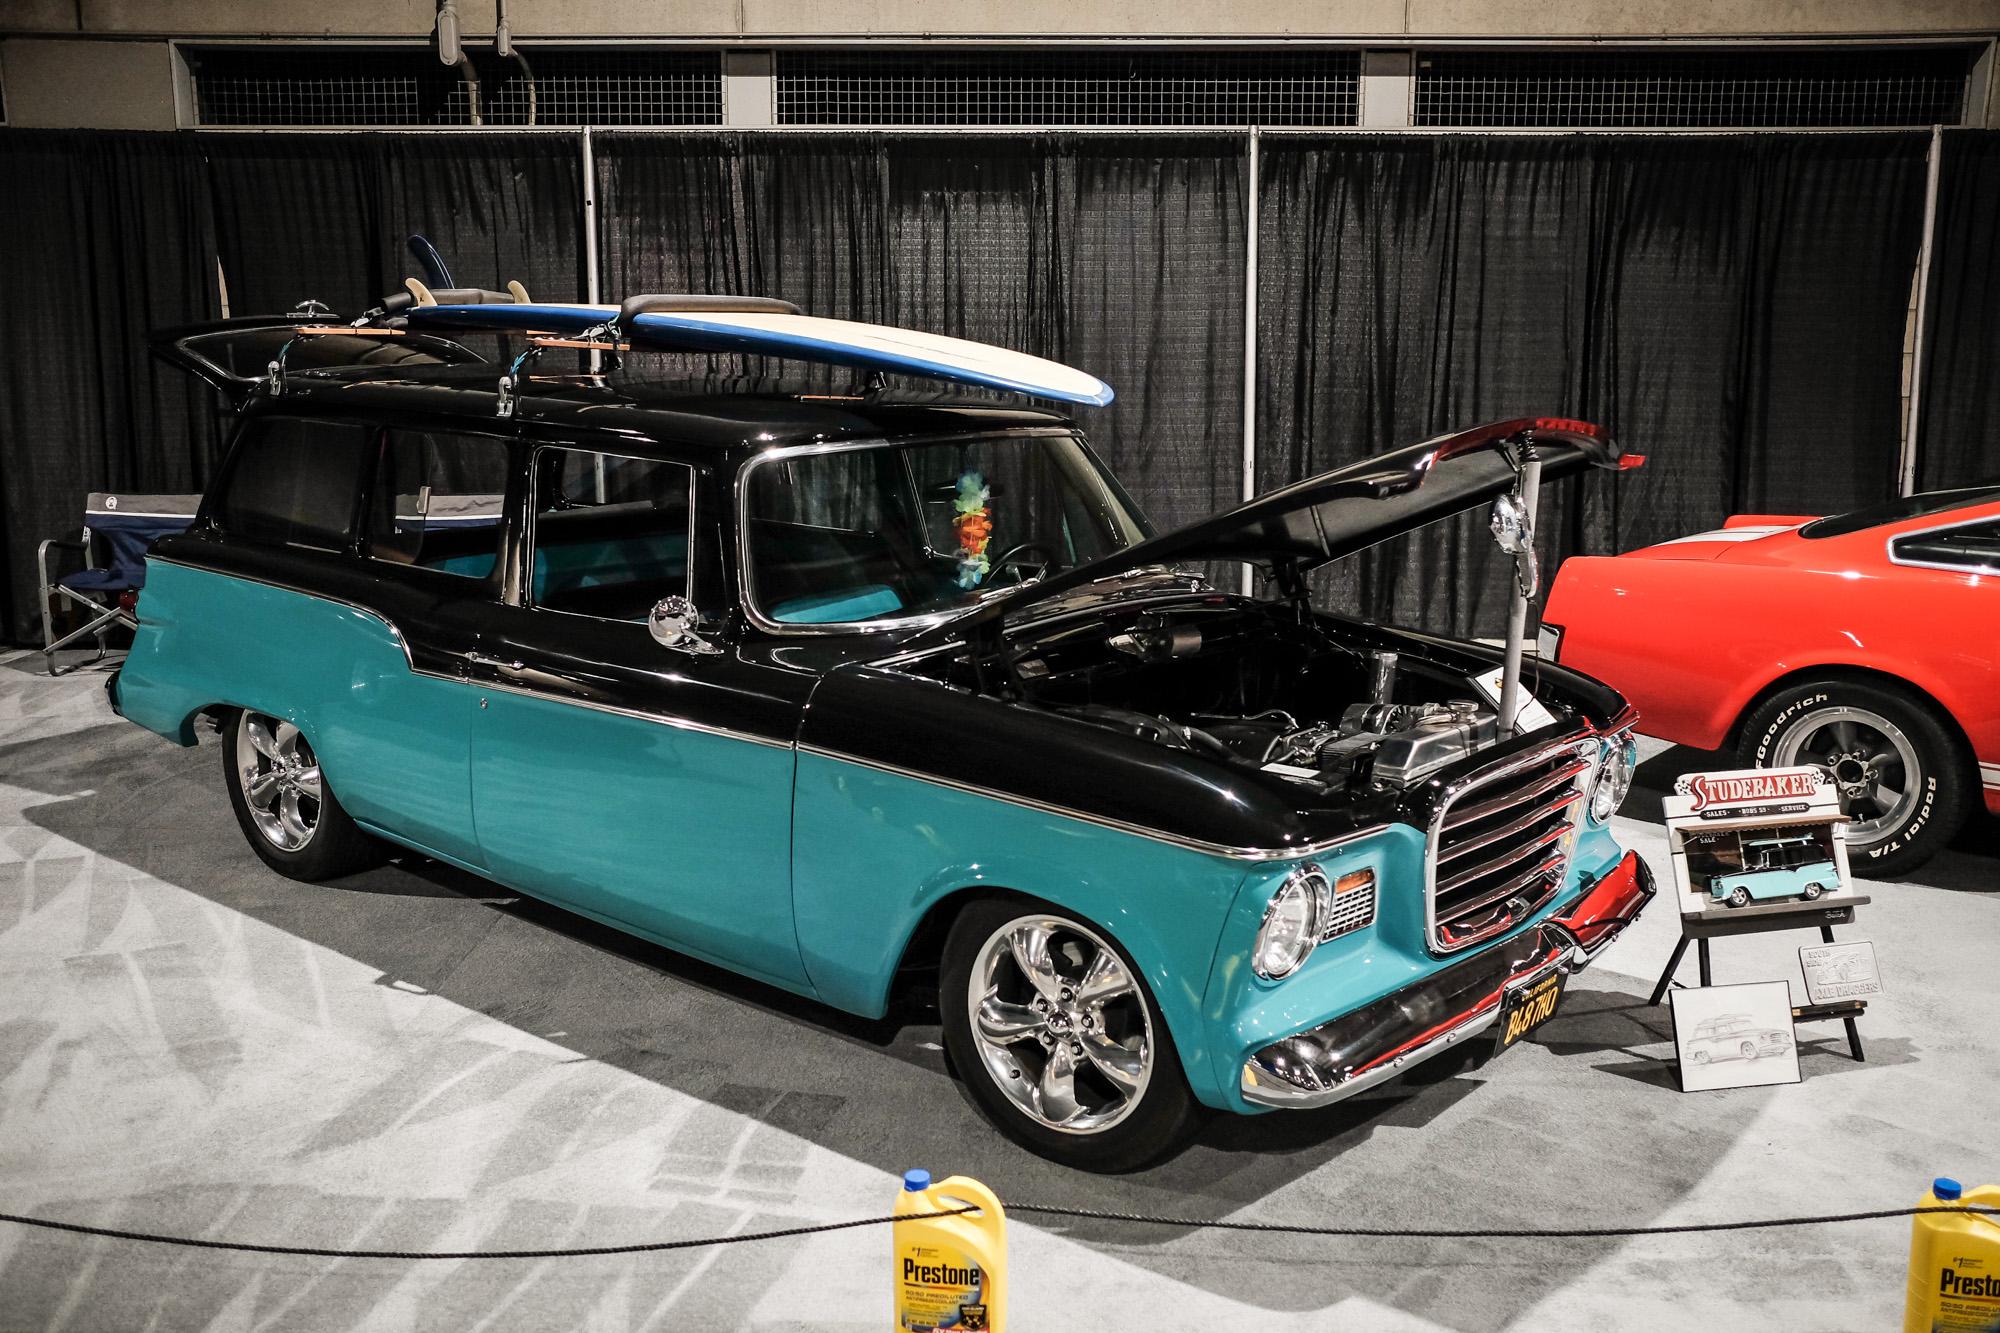 Check Out The Cool Classics Exotics And Trucks In The La Auto